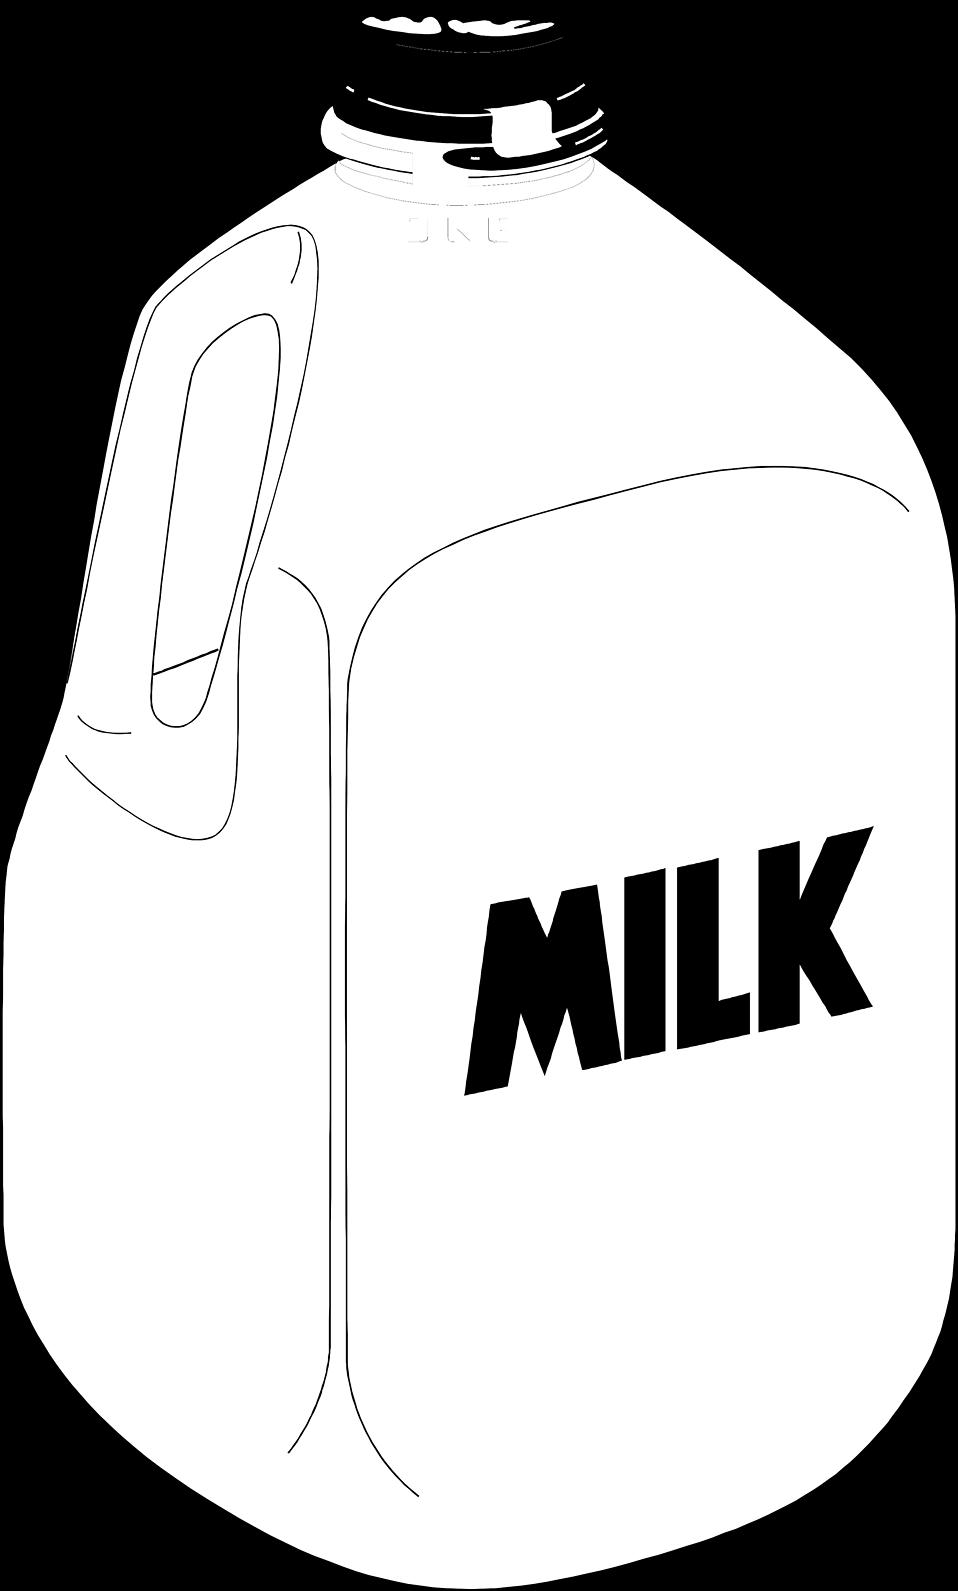 Free stock photo illustration. Milk clipart spilling